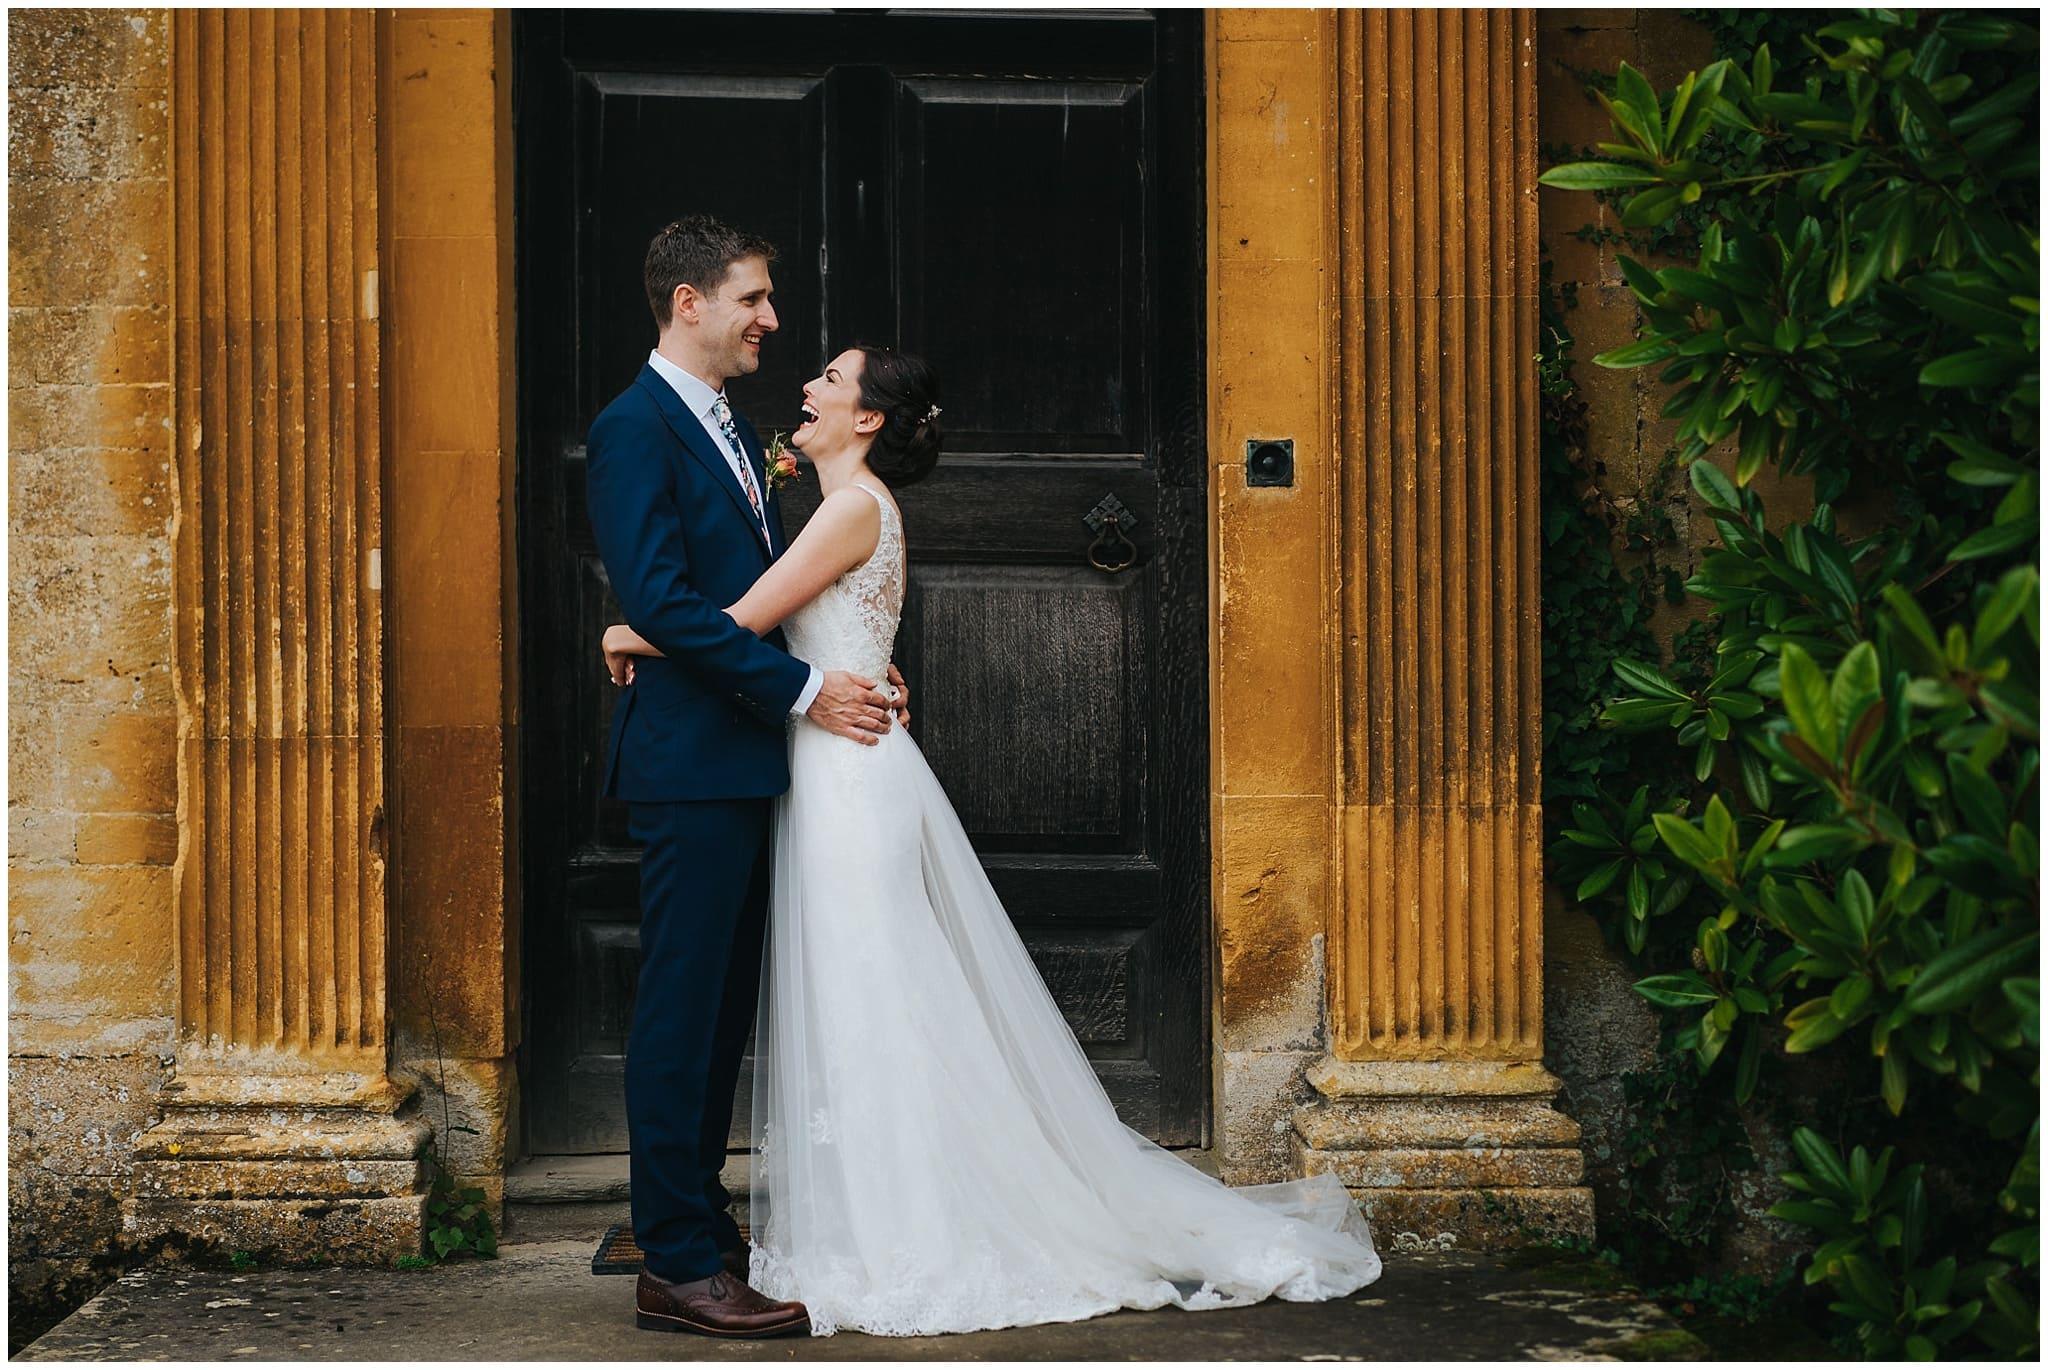 Stanway House Gloucester wedding photography075